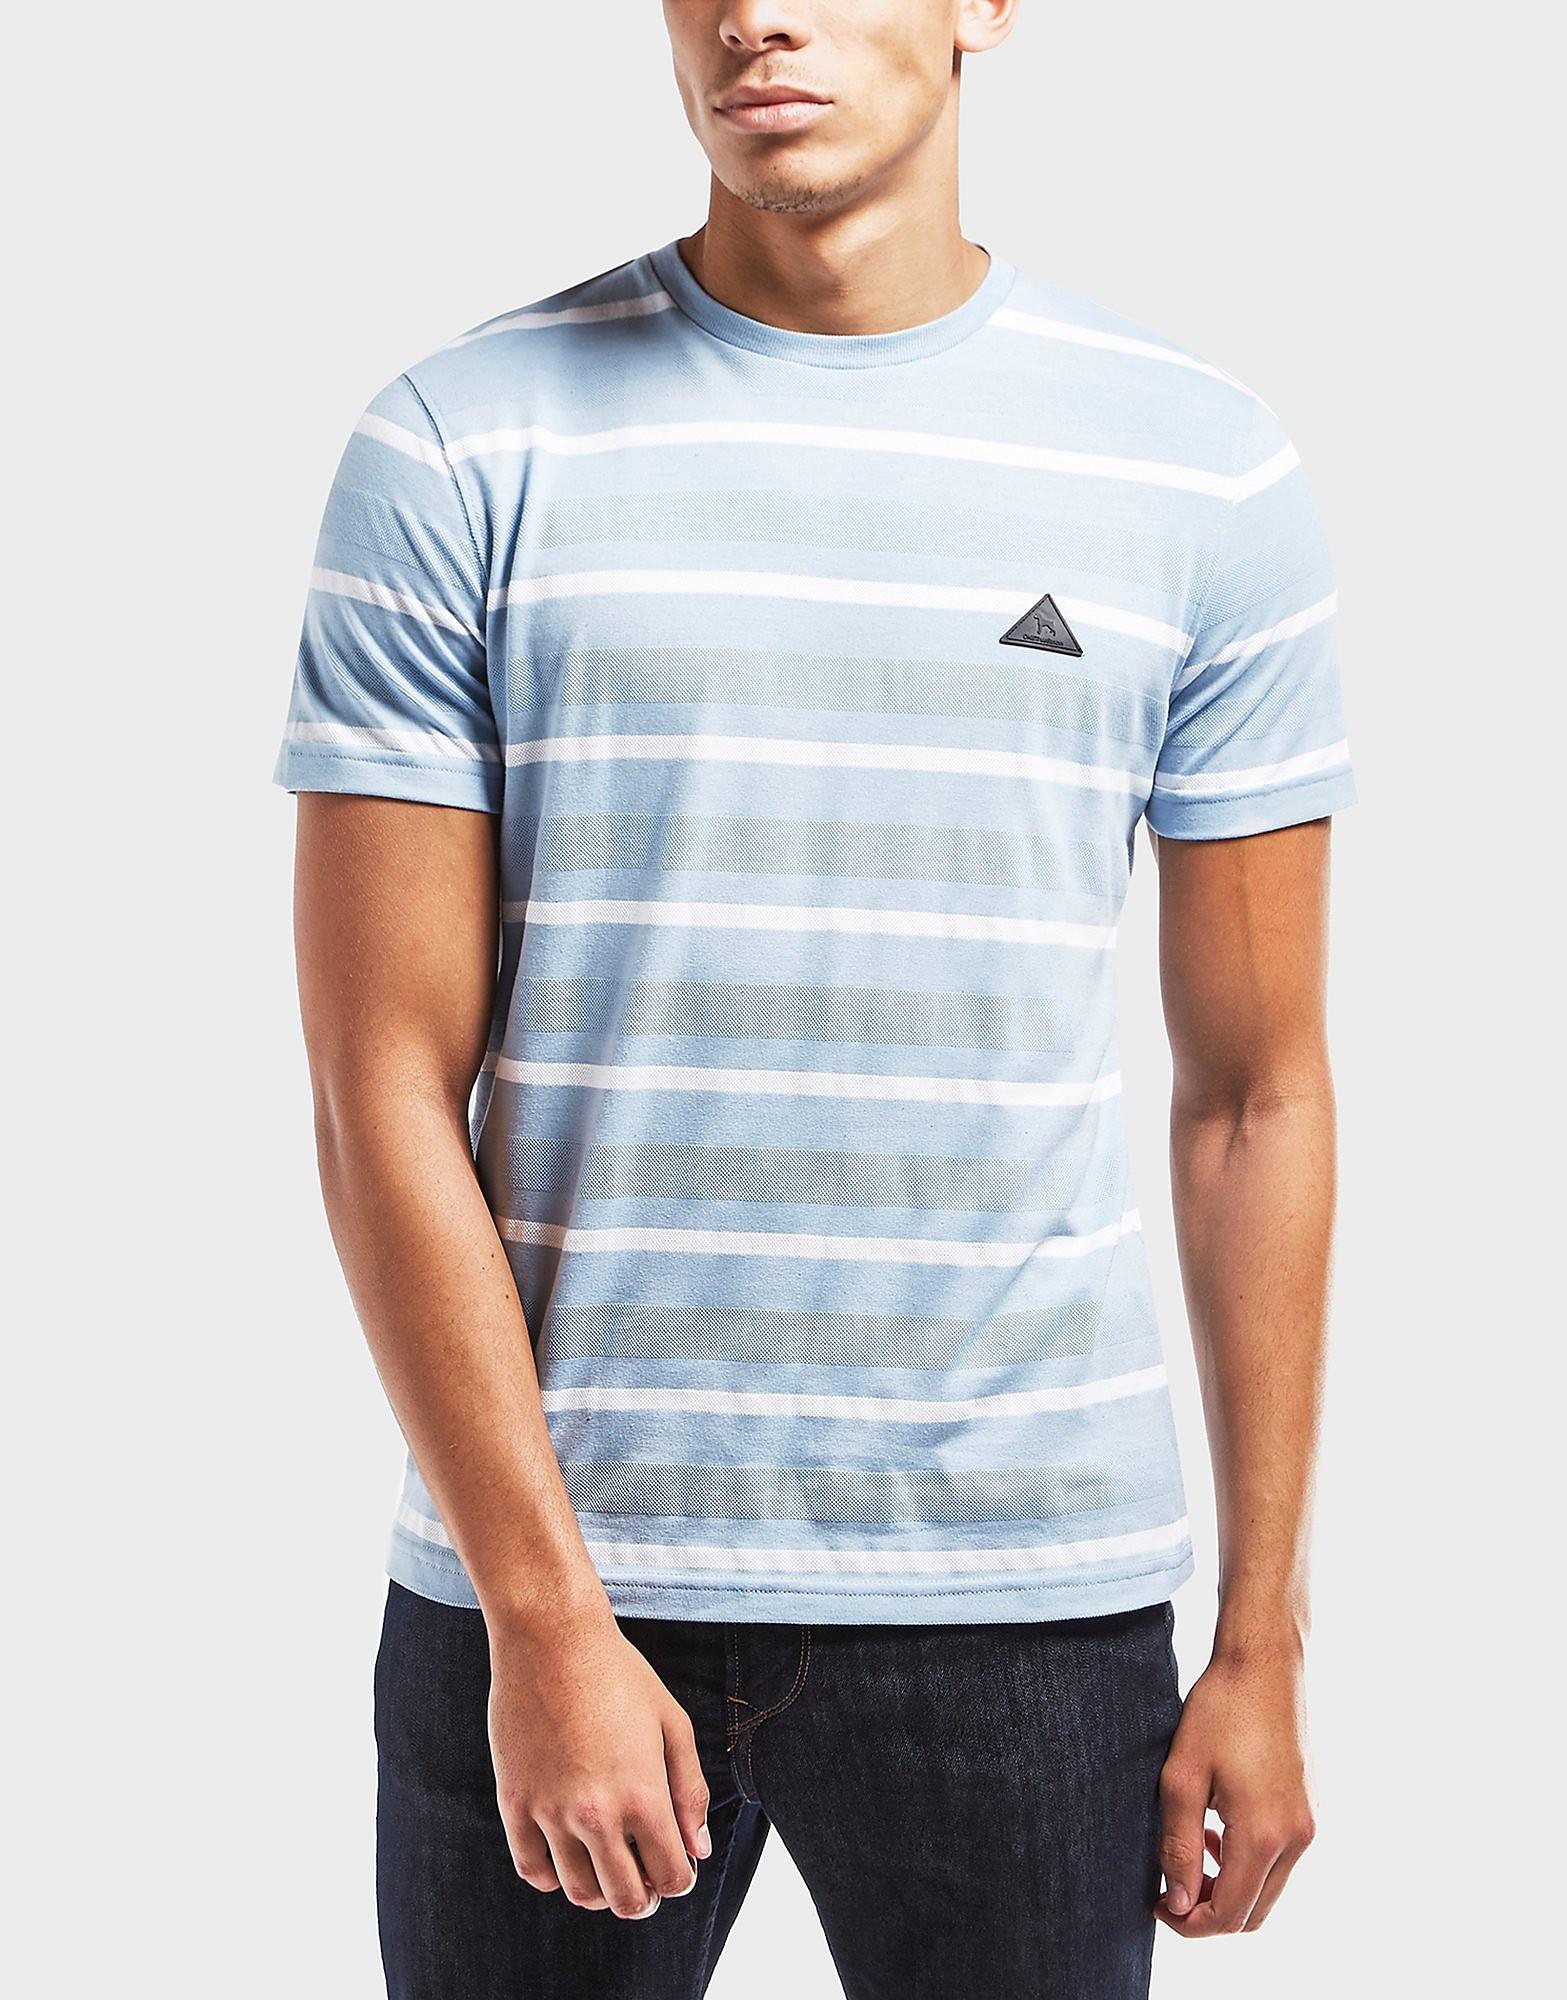 One True Saxon Tenue Short Sleeve T-Shirt - Exclusive